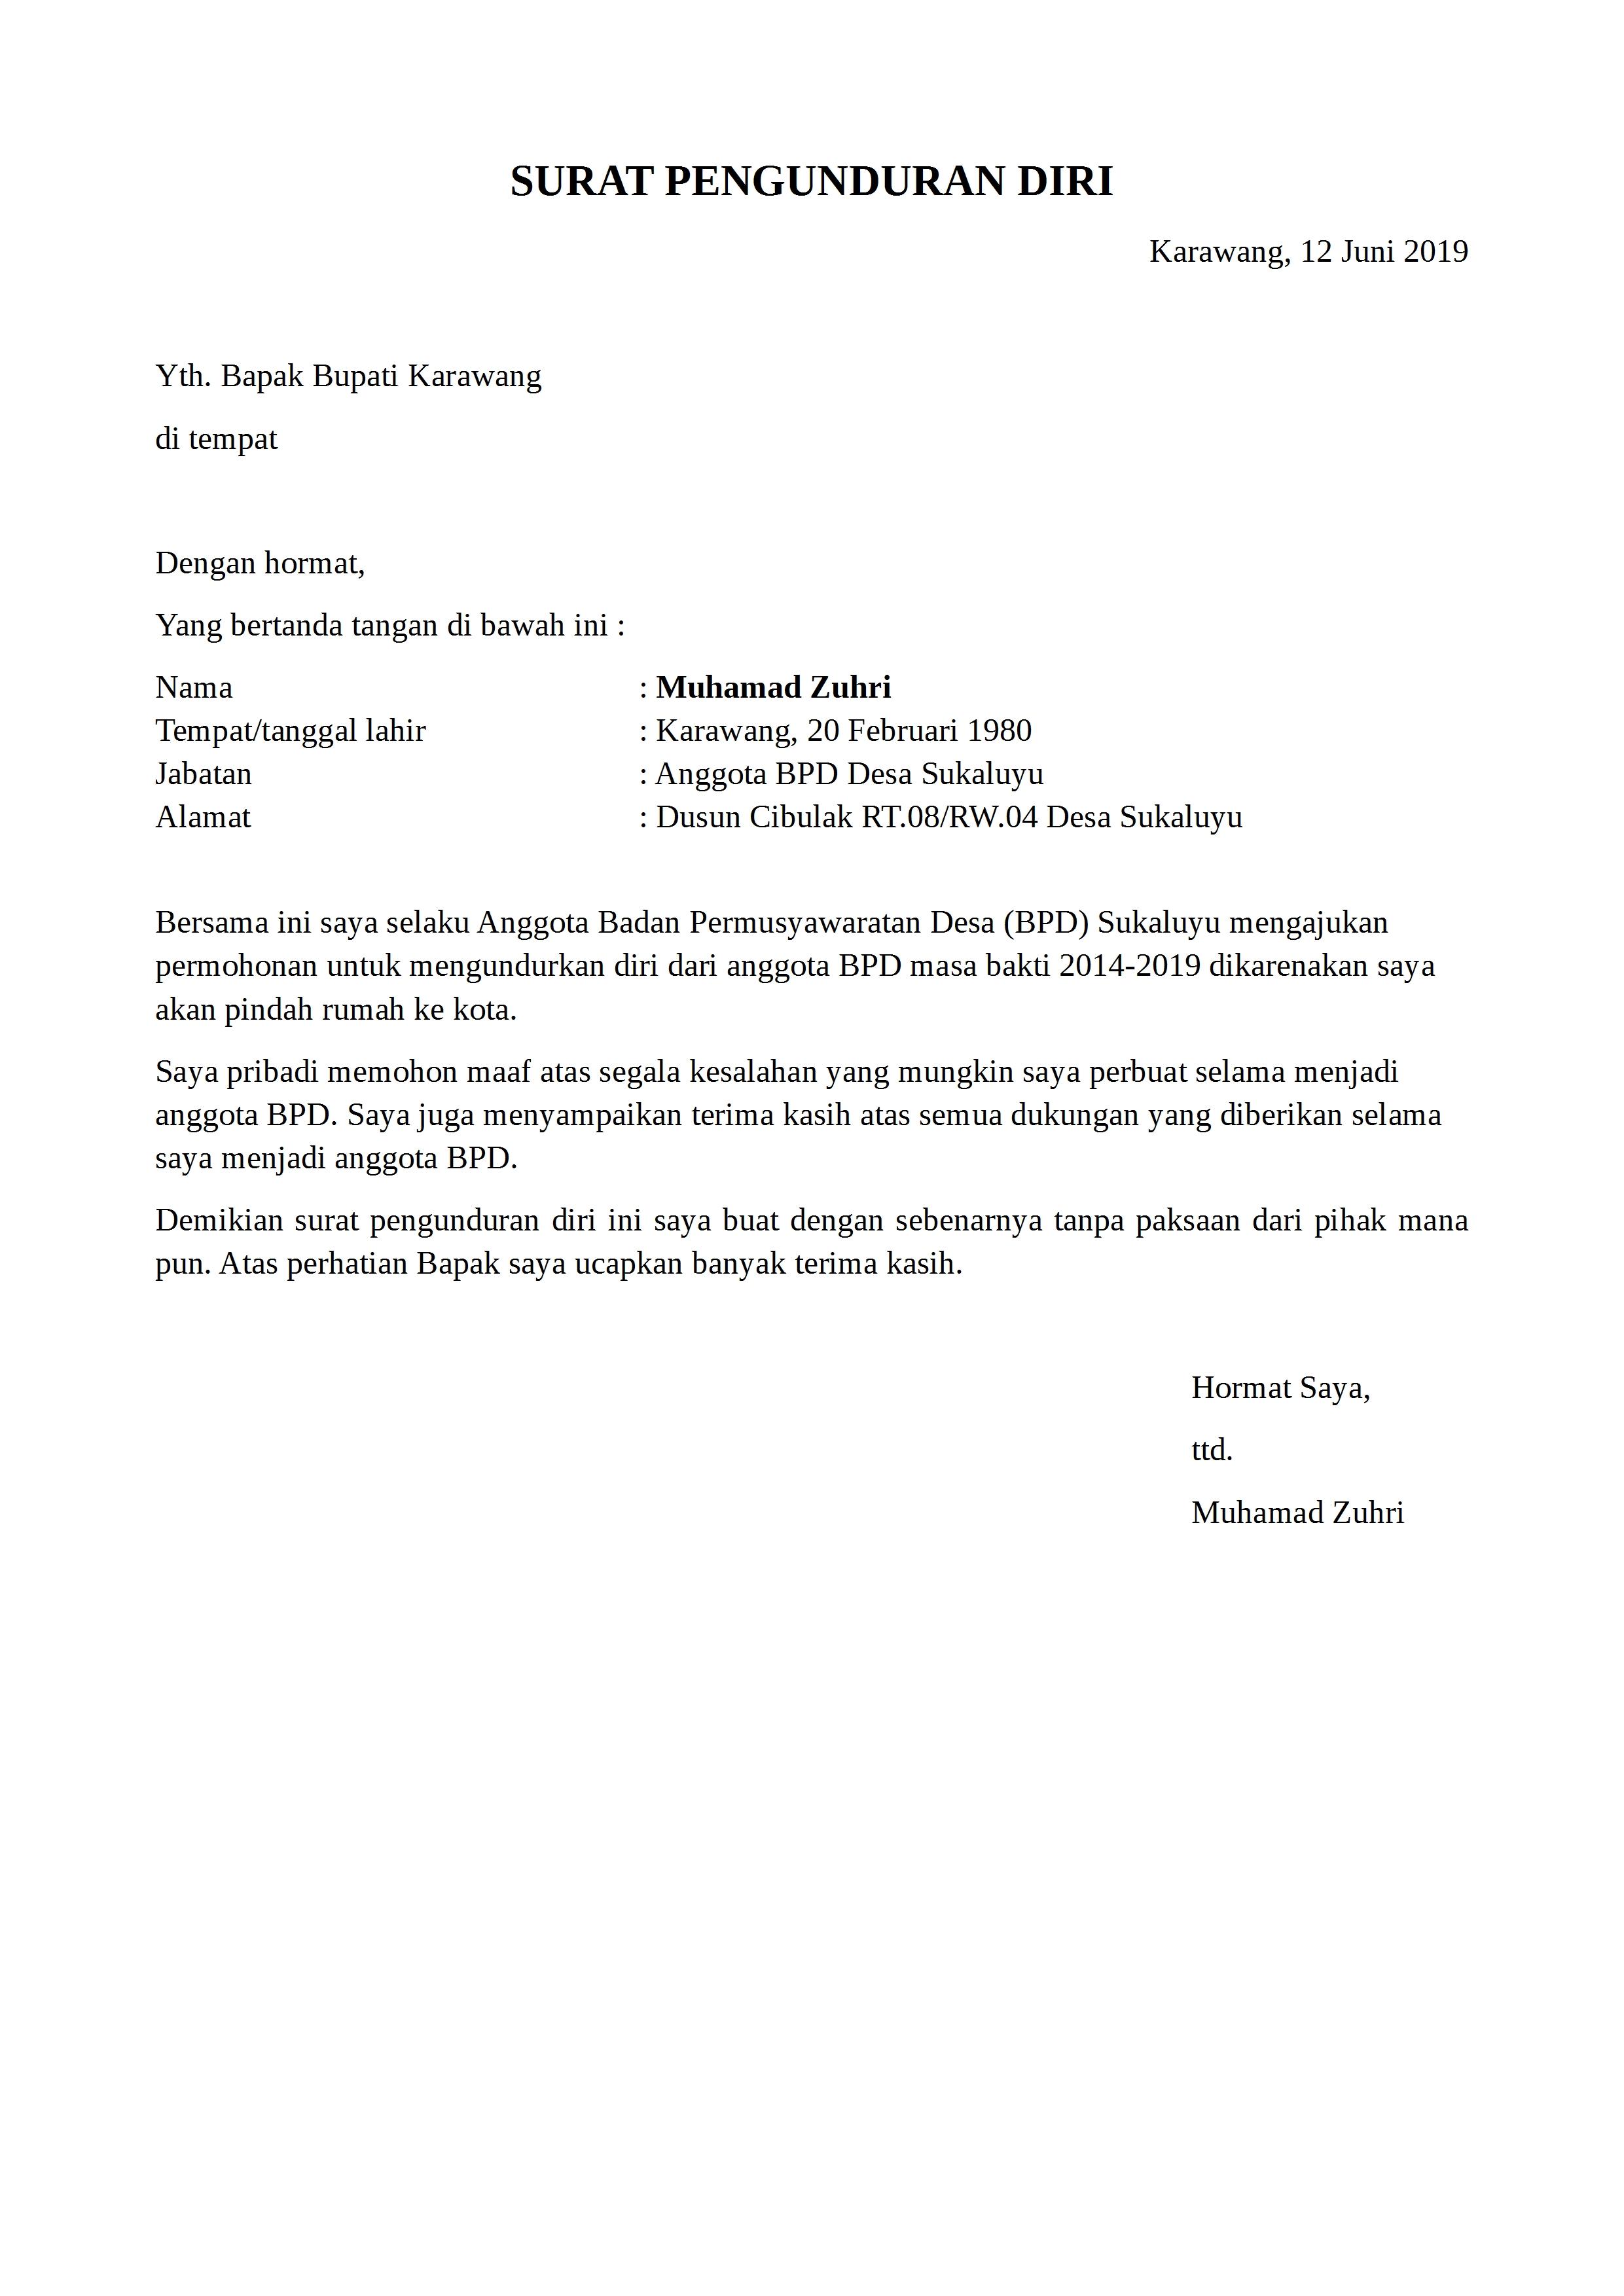 Contoh Surat Pengunduran Diri Lpm Desa